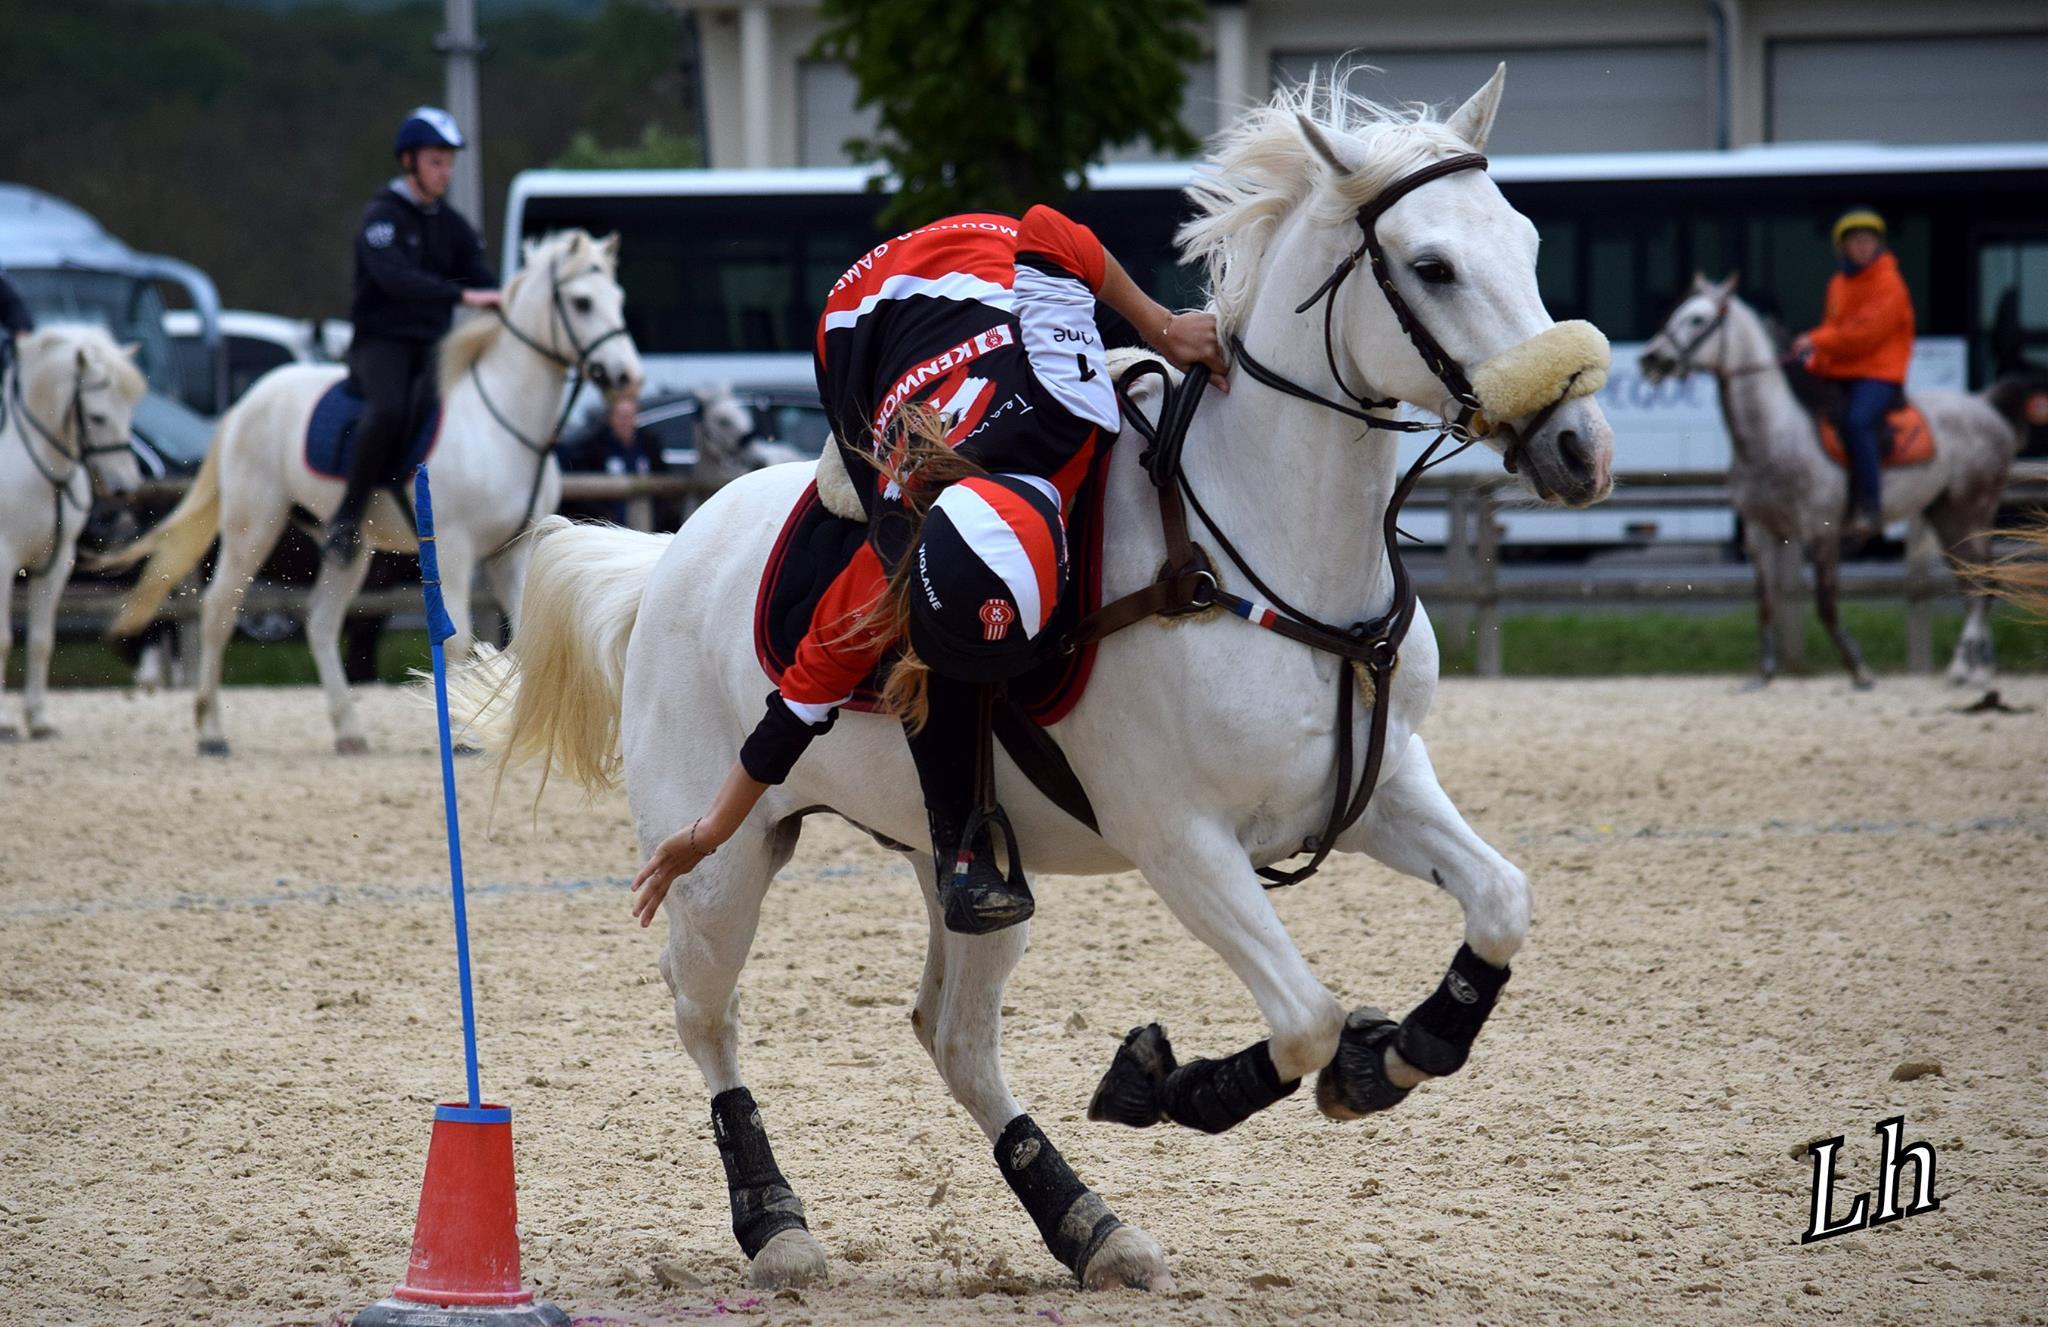 photo équitation mounted games poney